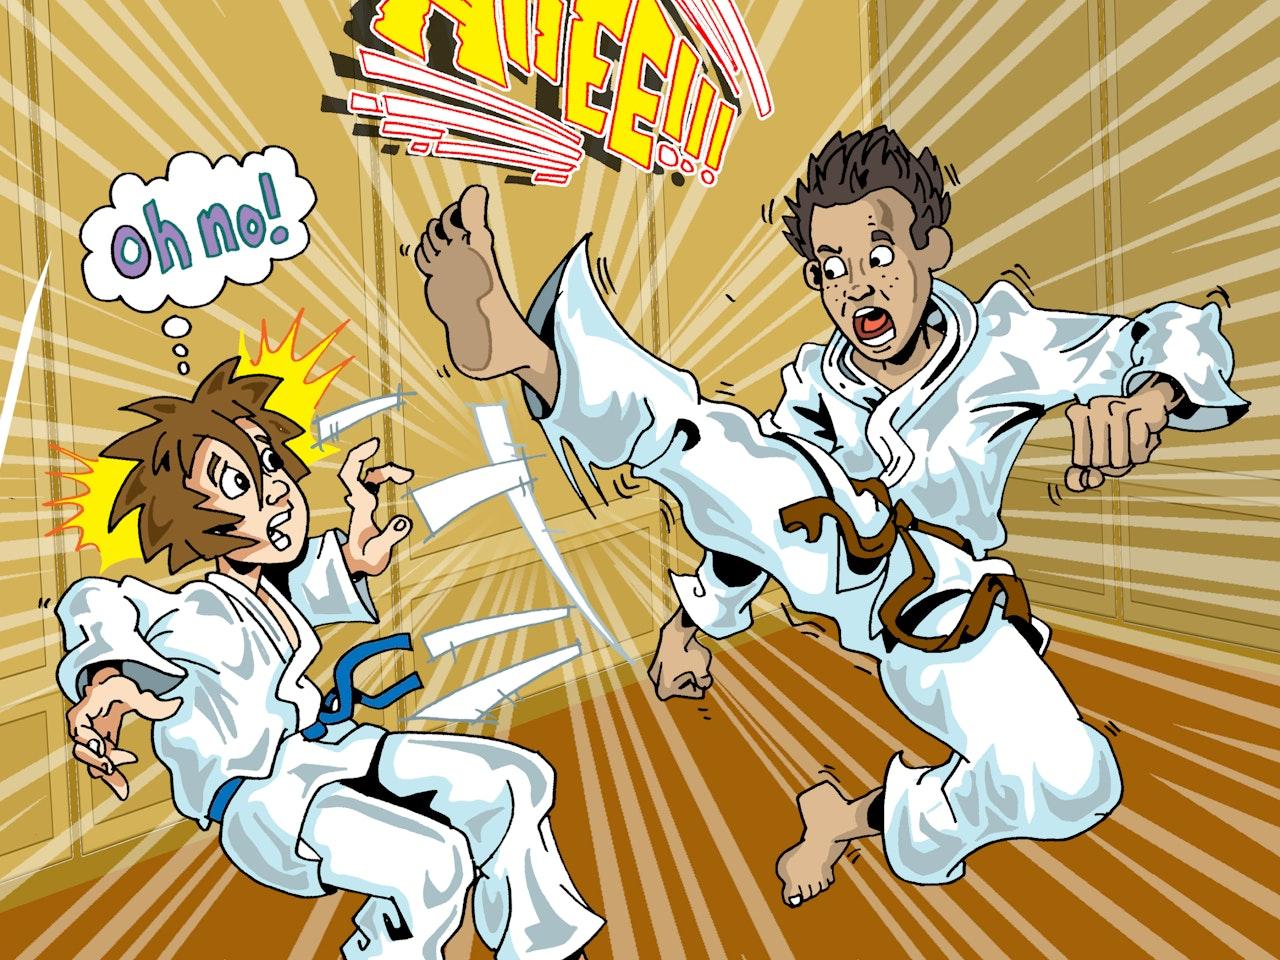 sad cafe martial arts kung fu fighting karate fantasy adventure Funky Happy manga anime childrens cartoon comic strip Book cover illustration animation